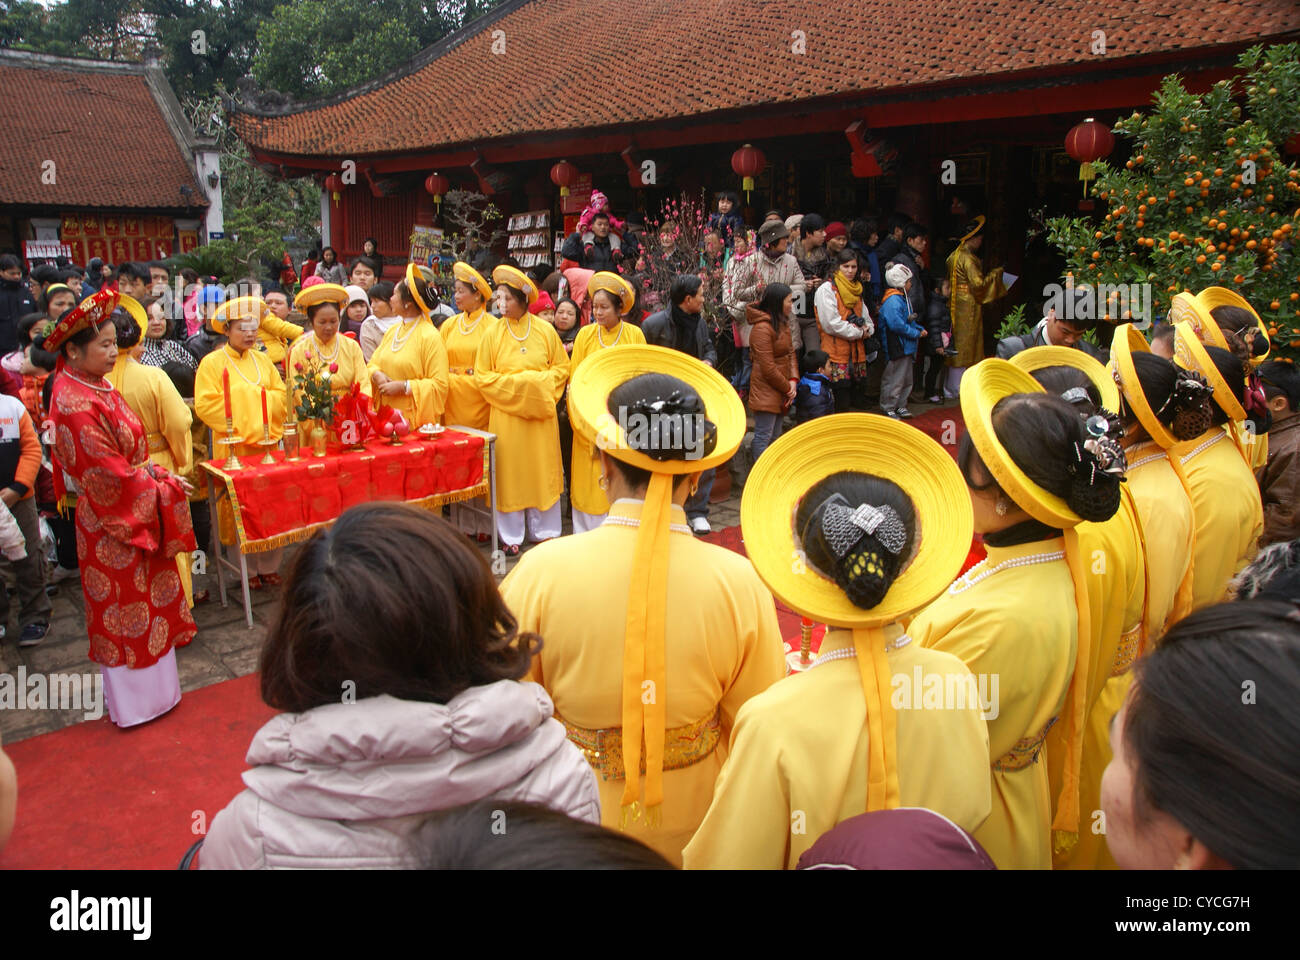 Temple of Literature, Hanoi, Vietnam, Traditional dancers - Stock Image